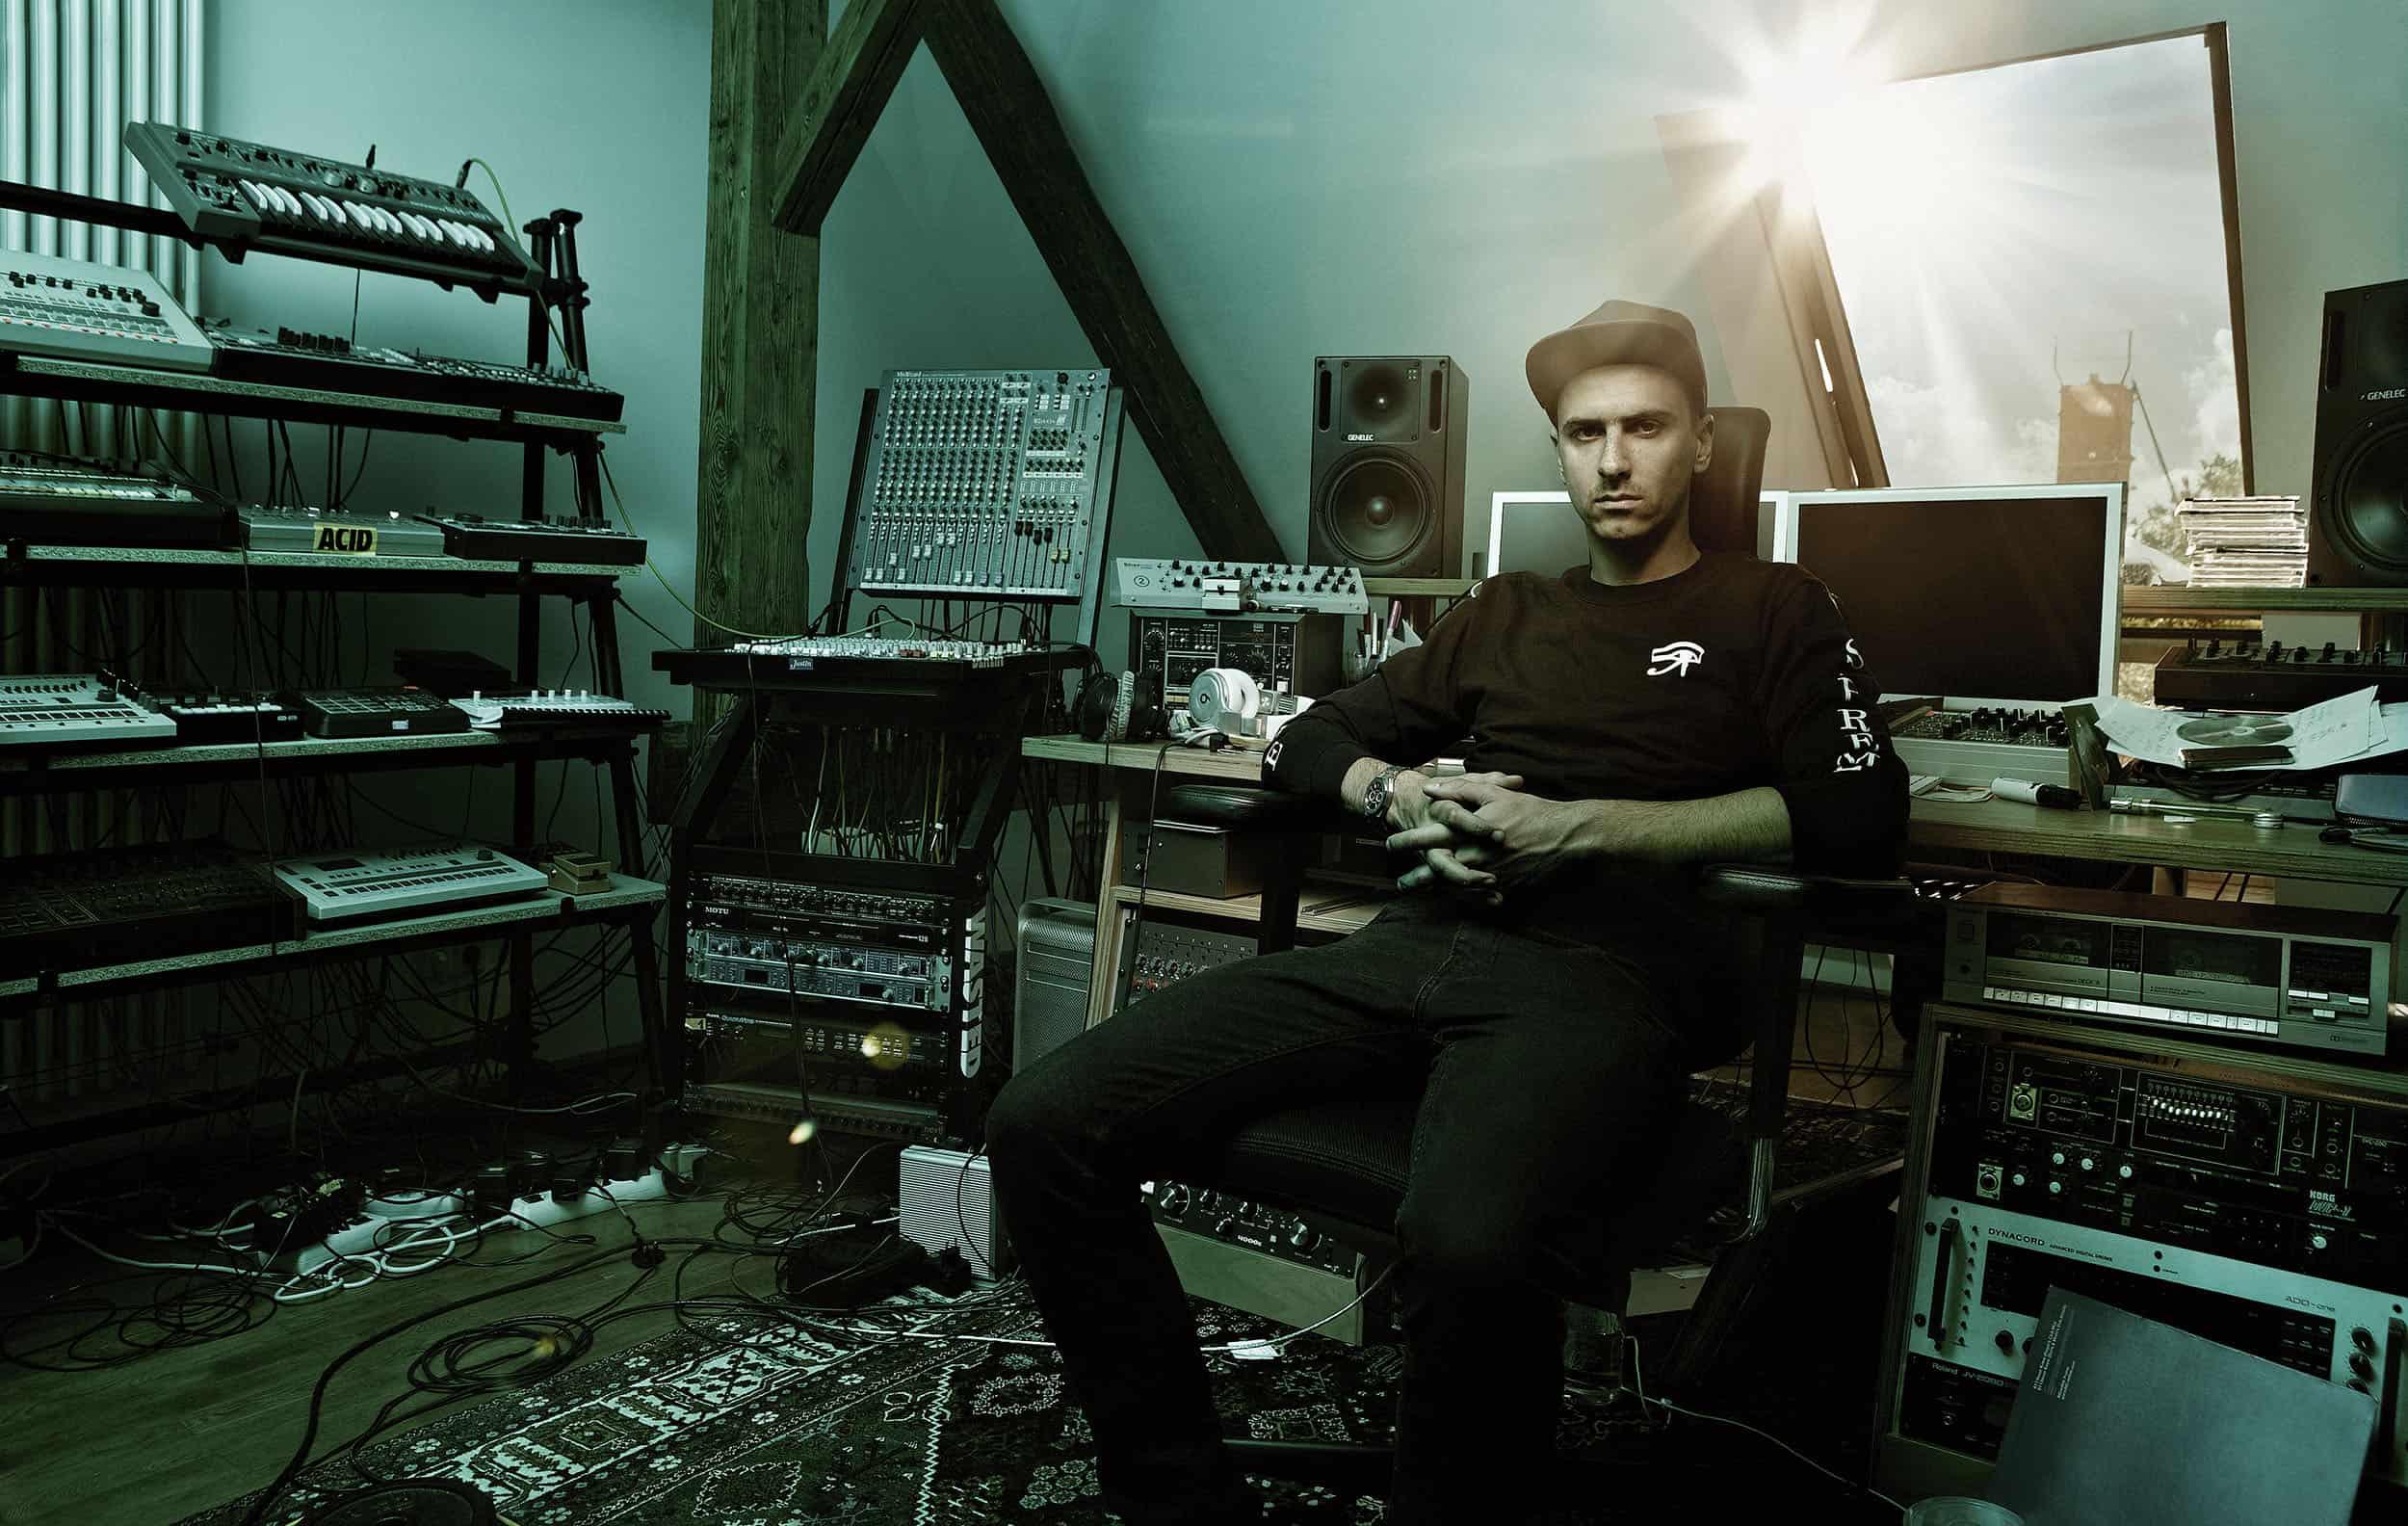 studio-ignatov-musicians-boysnoize-berlin-03